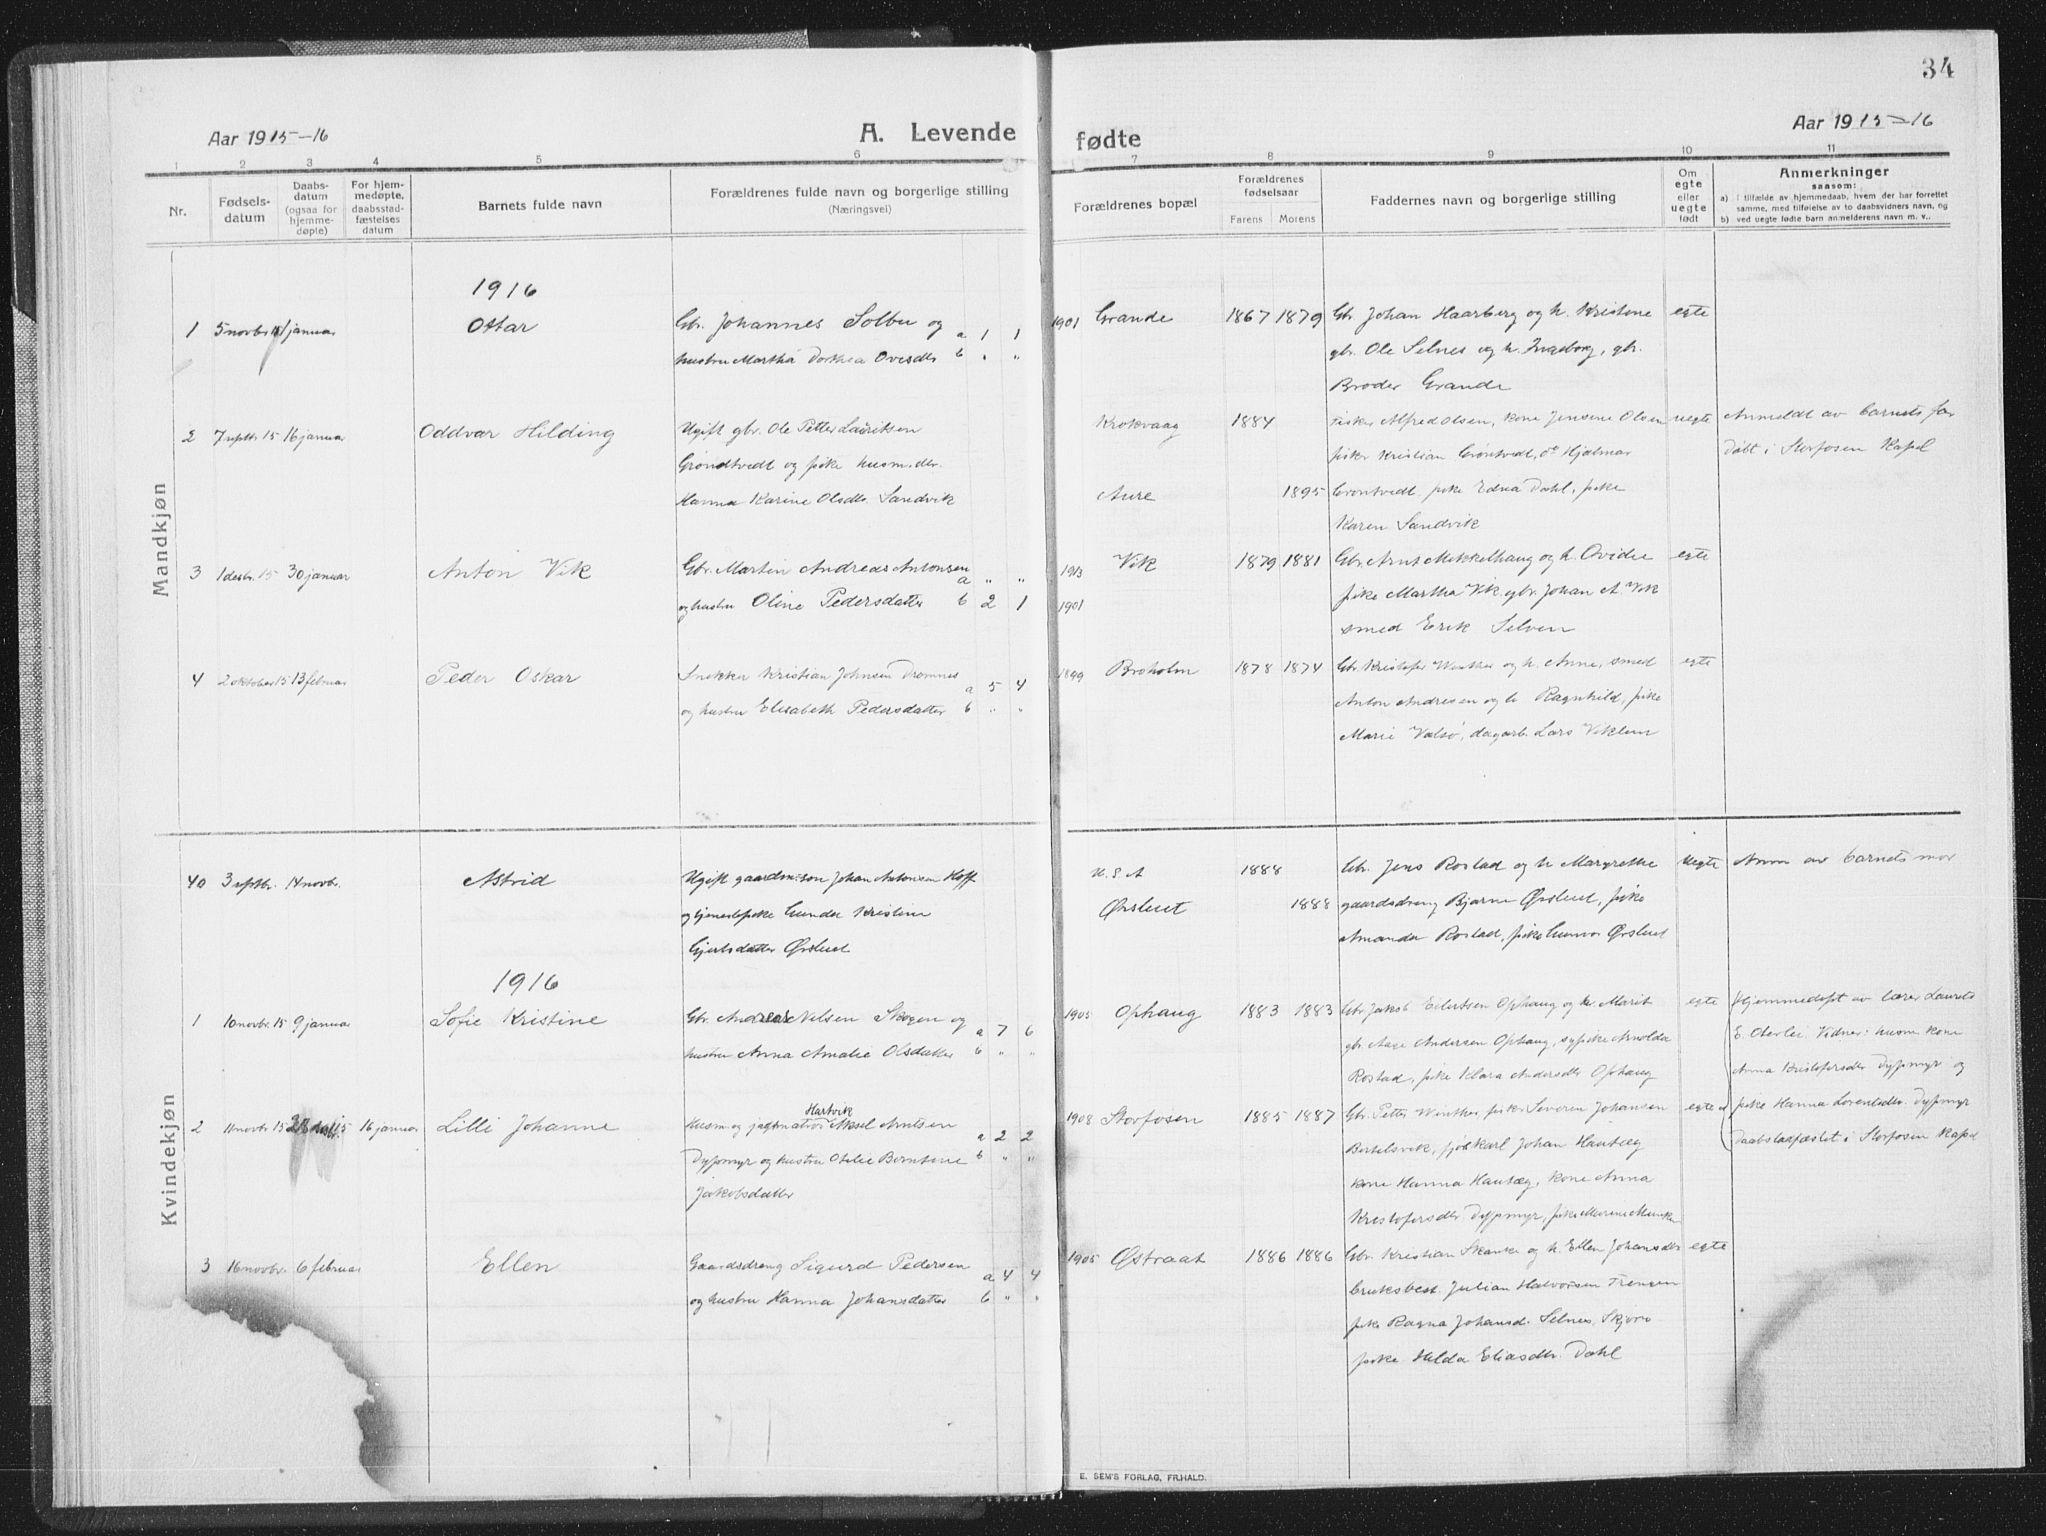 SAT, Ministerialprotokoller, klokkerbøker og fødselsregistre - Sør-Trøndelag, 659/L0747: Parish register (copy) no. 659C04, 1913-1938, p. 34